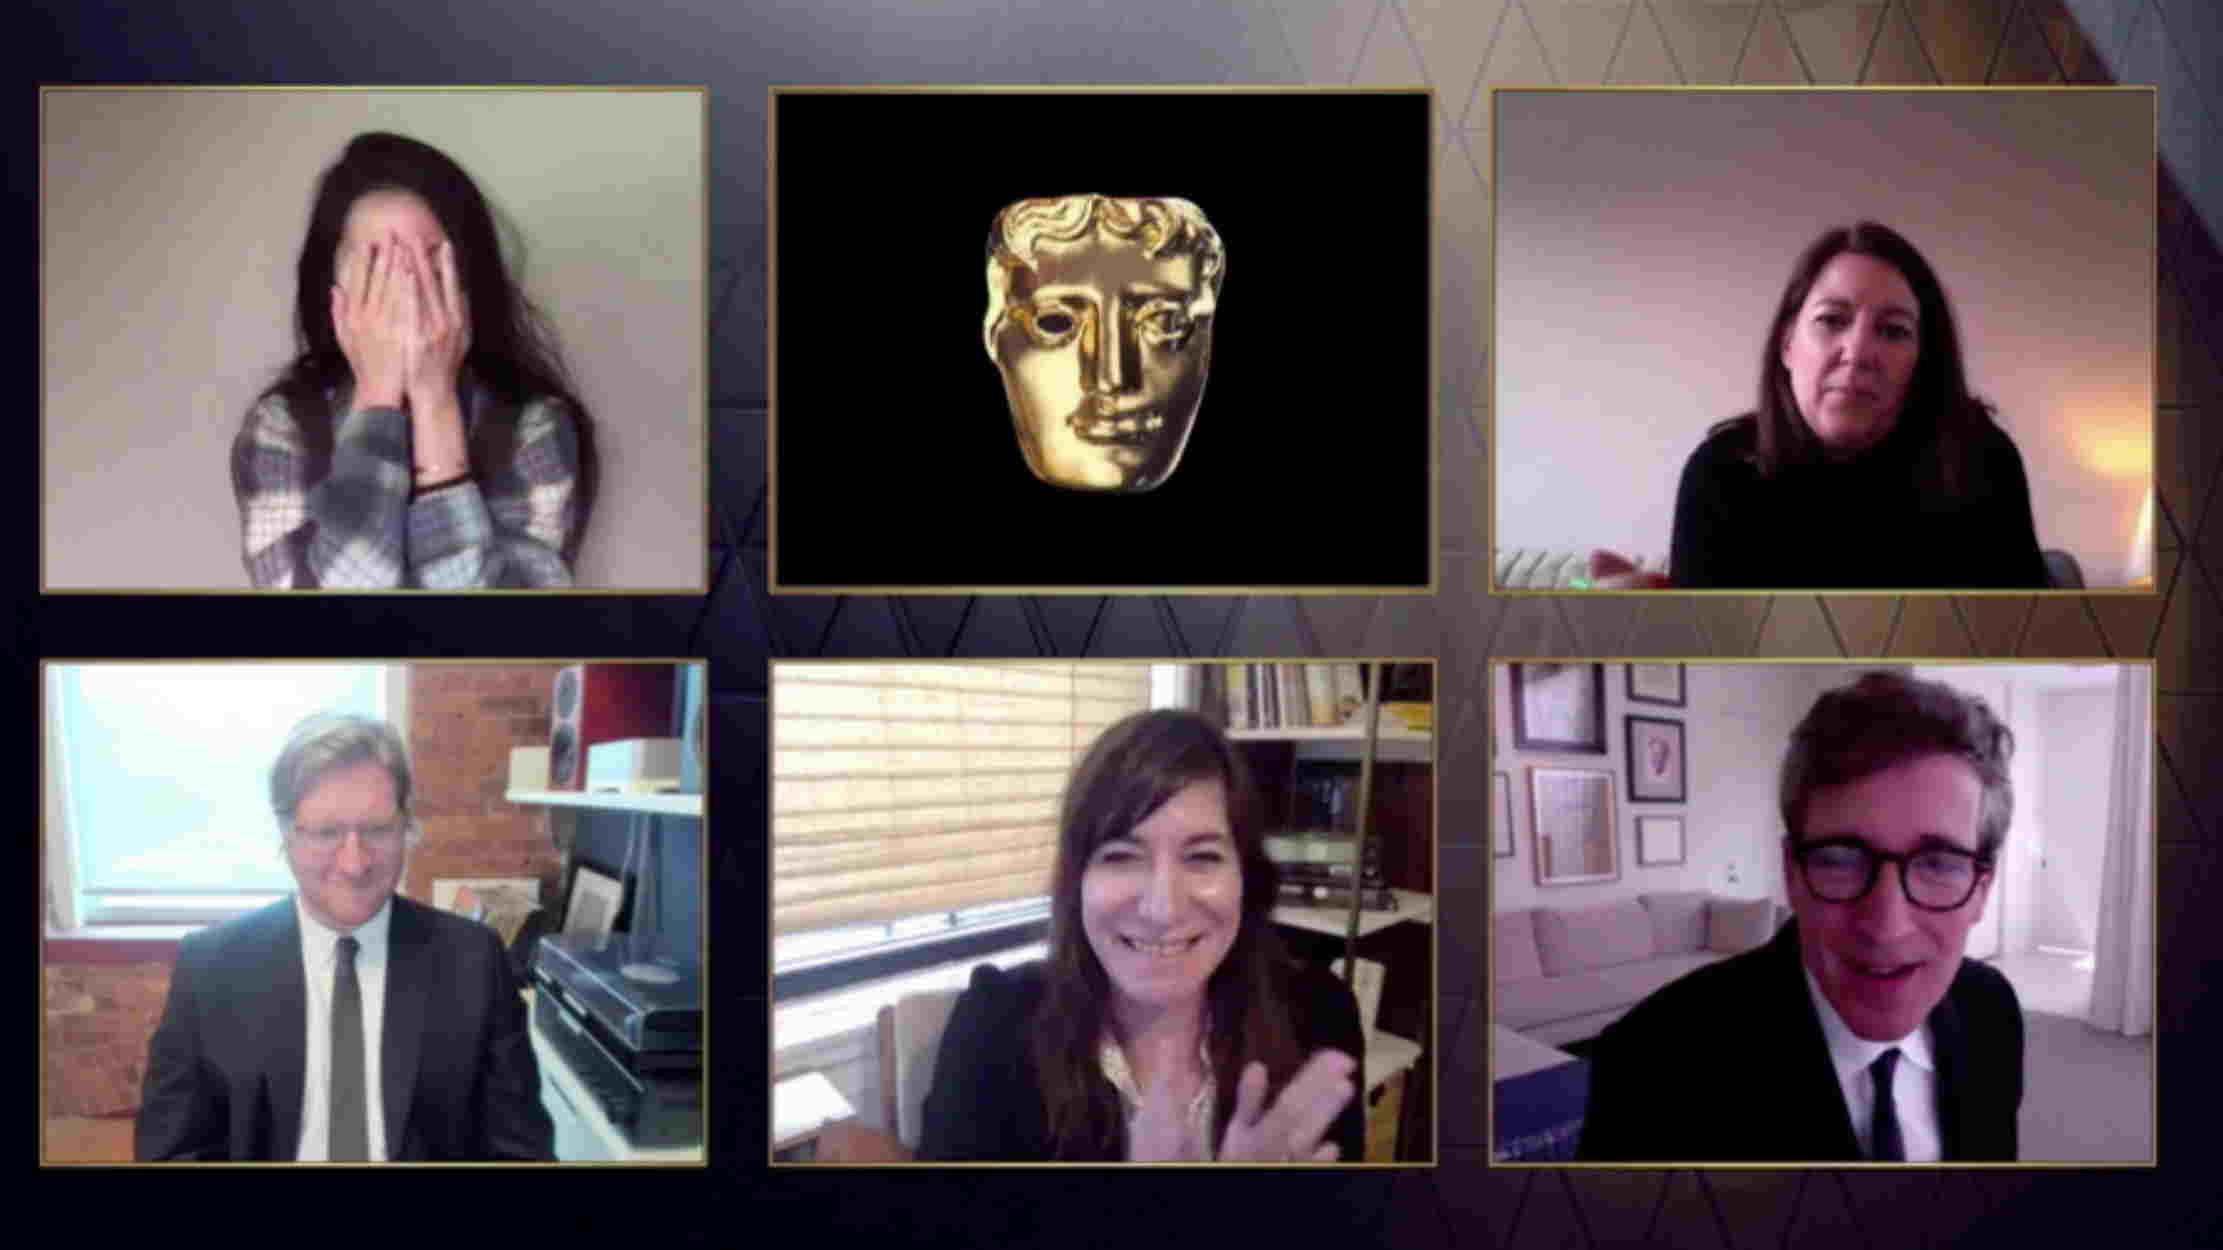 BAFTA 2021: Το Nomadland καλύτερη ταινία, σάρωσε τα βραβεία